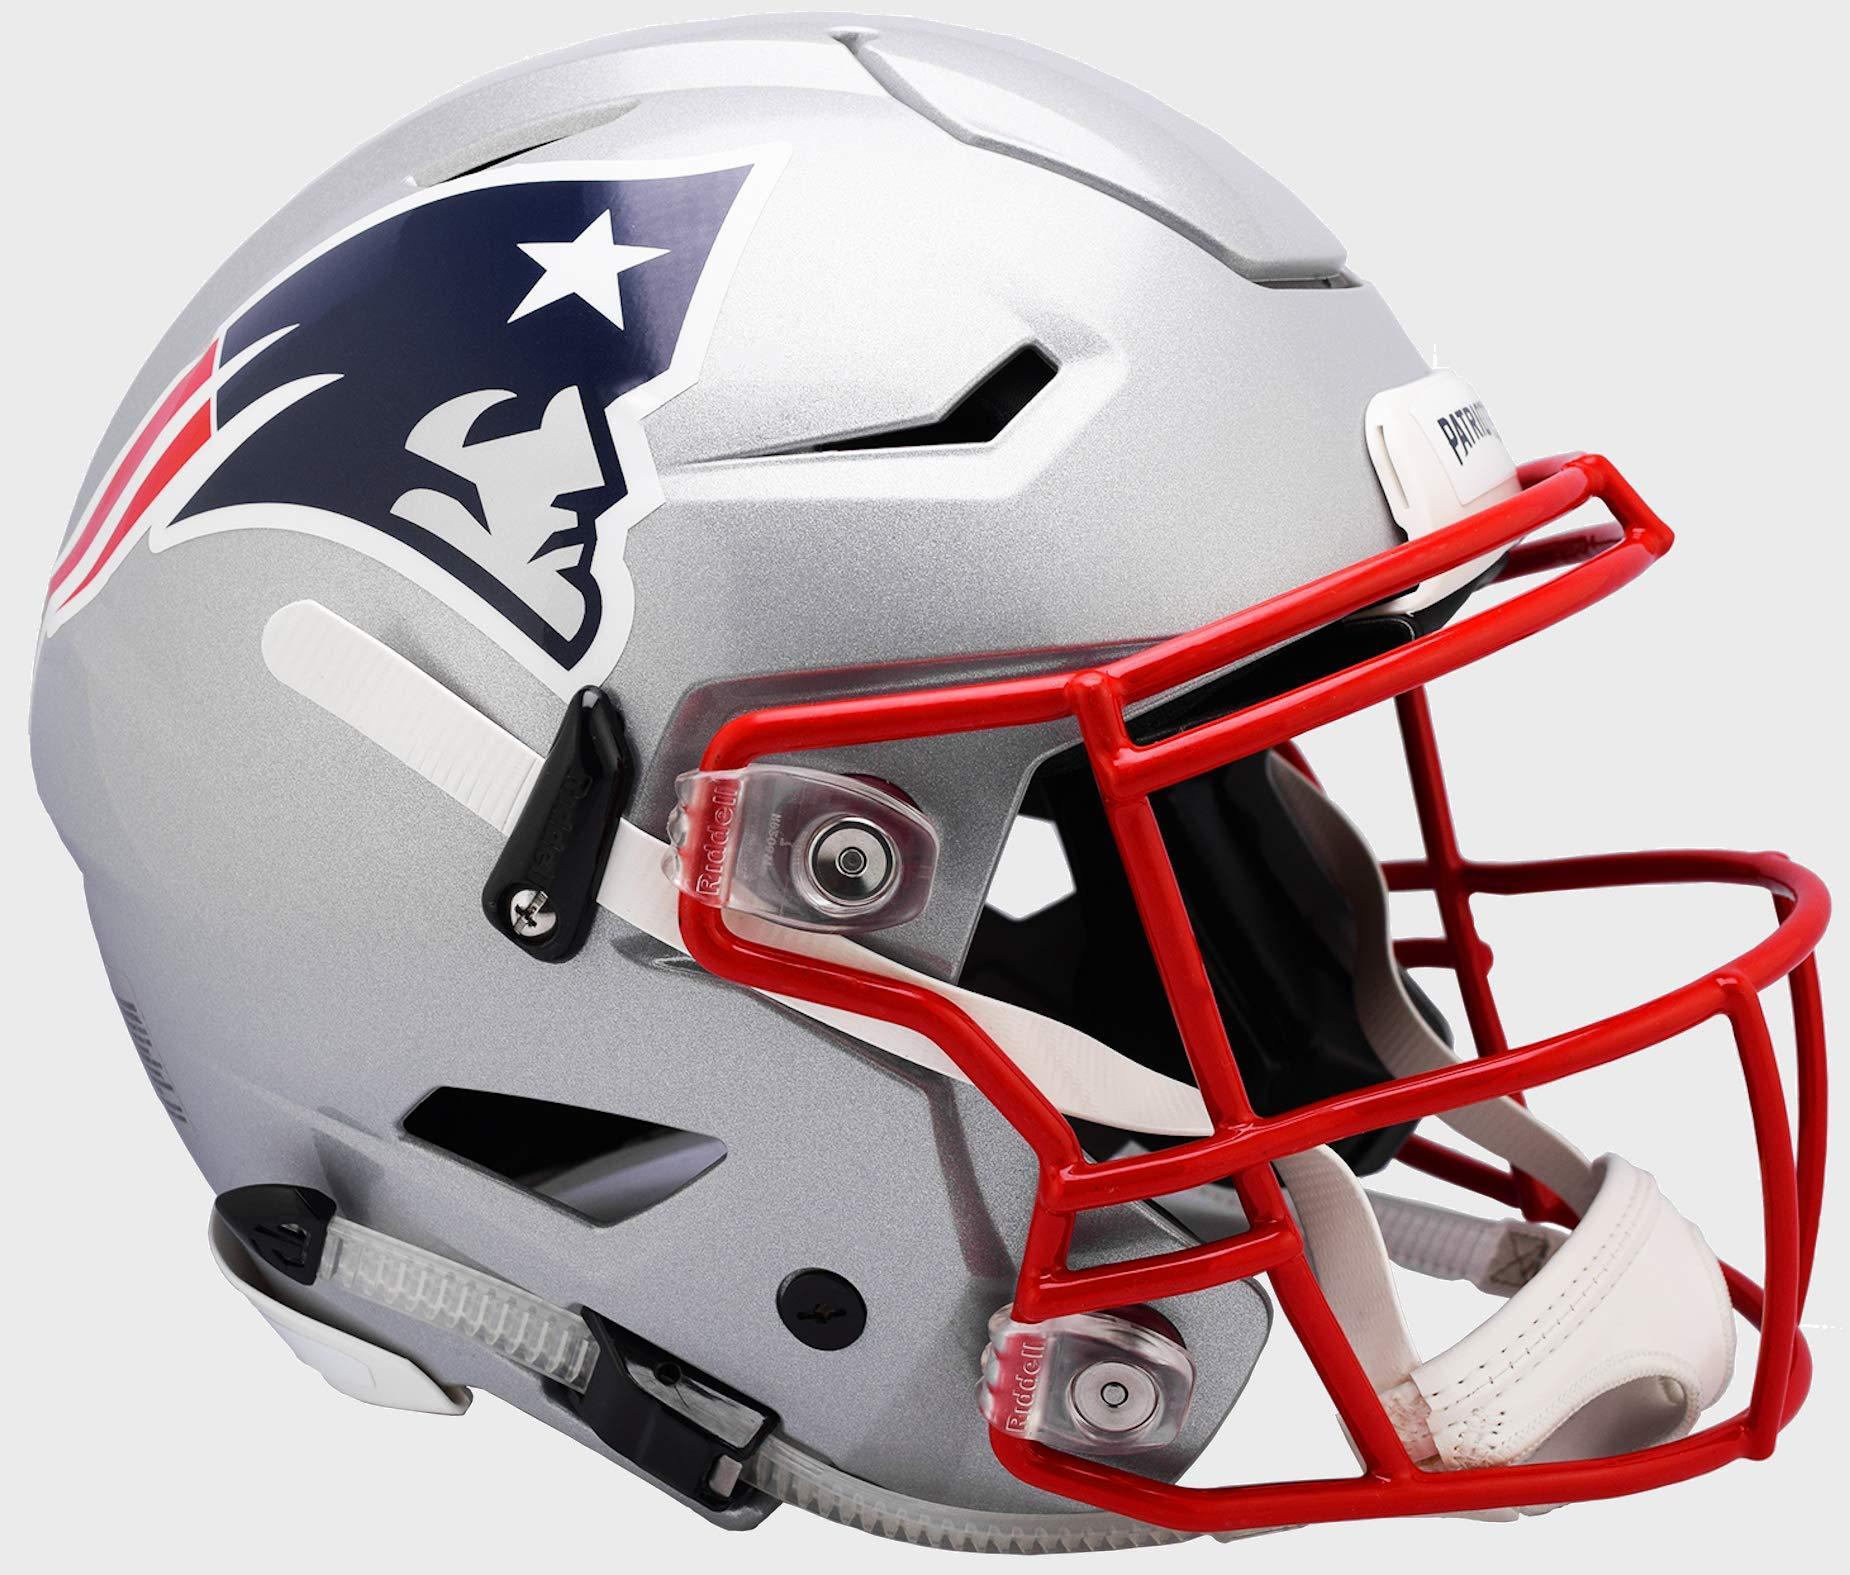 Riddell NFL New England Patriots Speedflex Authentic Helmet